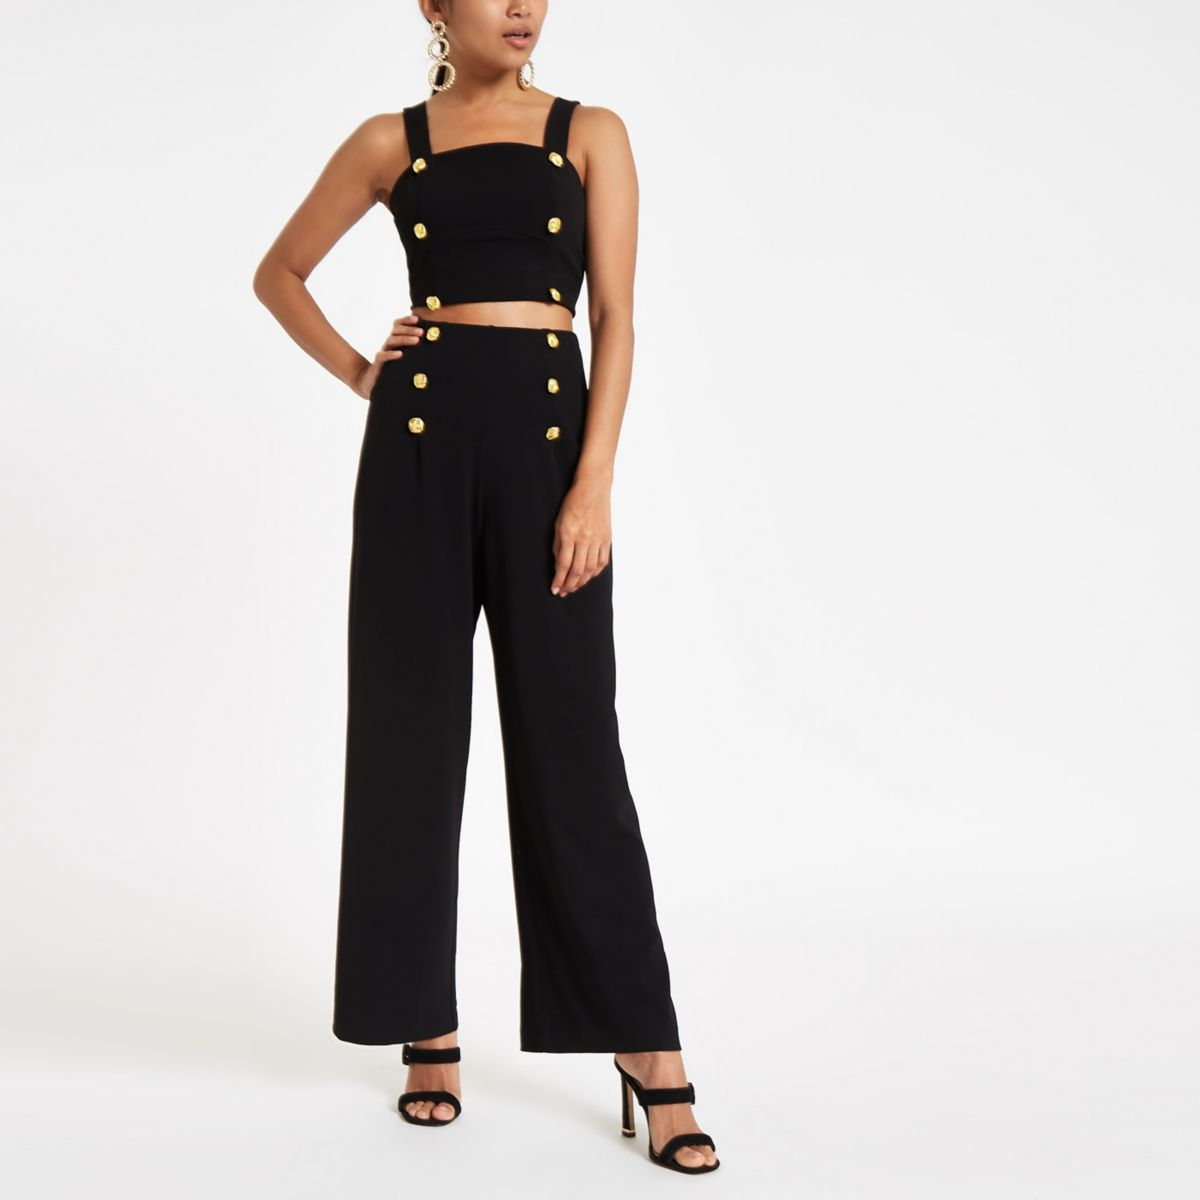 Petite black wide leg high waisted trousers